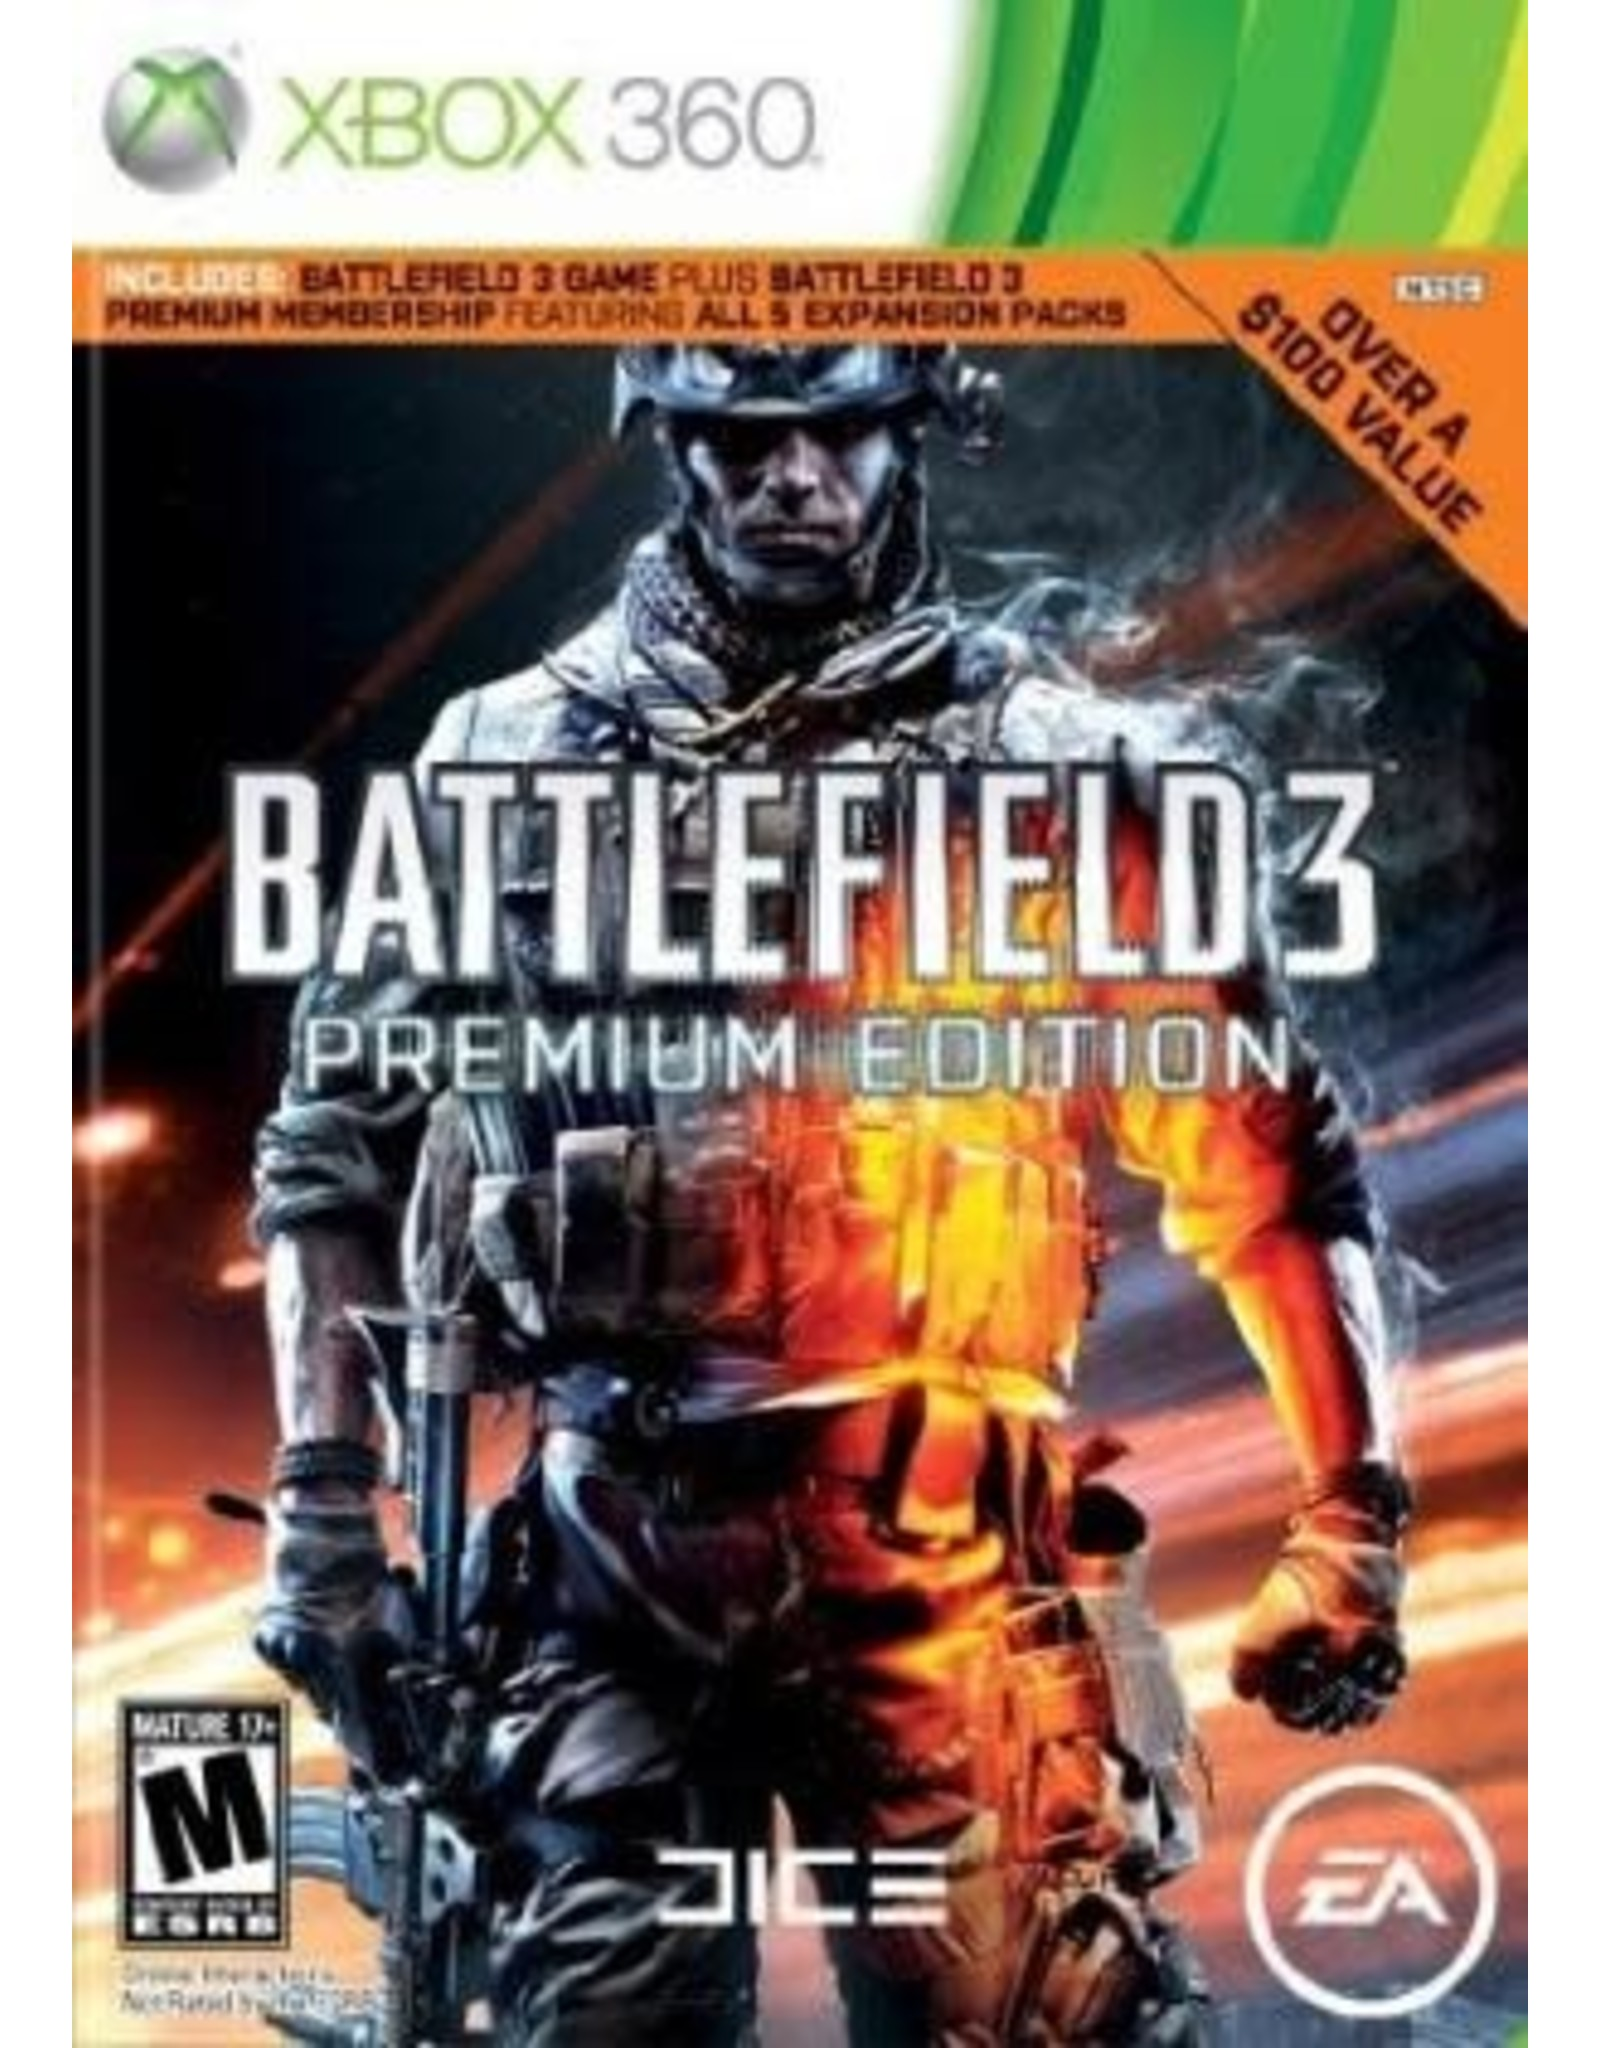 Xbox 360 Battlefield 3 Premium Edition No DLC (CIB)